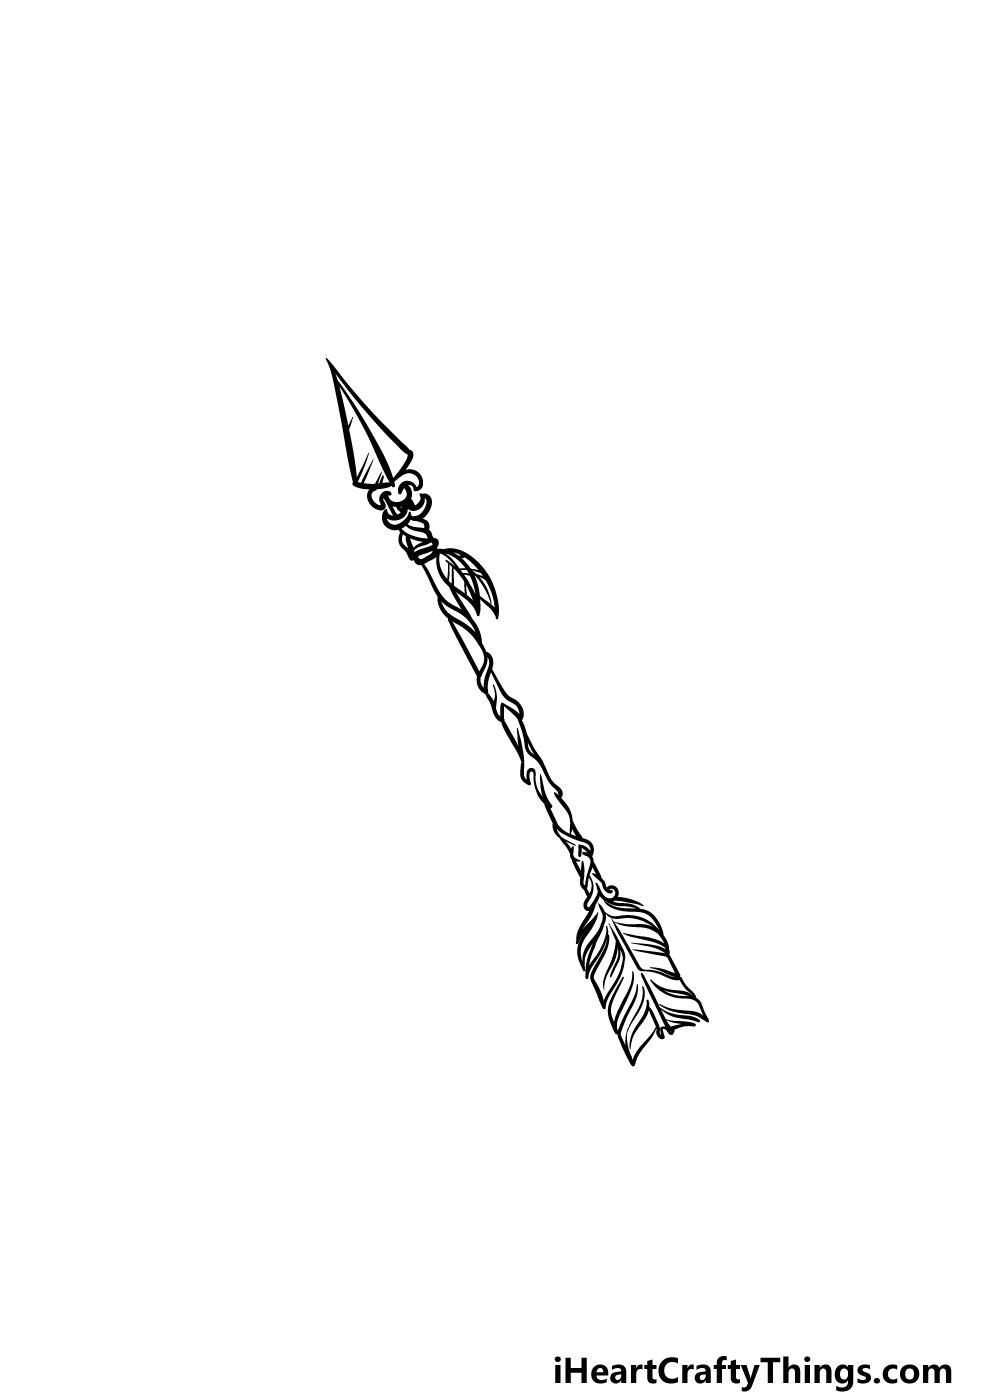 drawing an arrow step 5